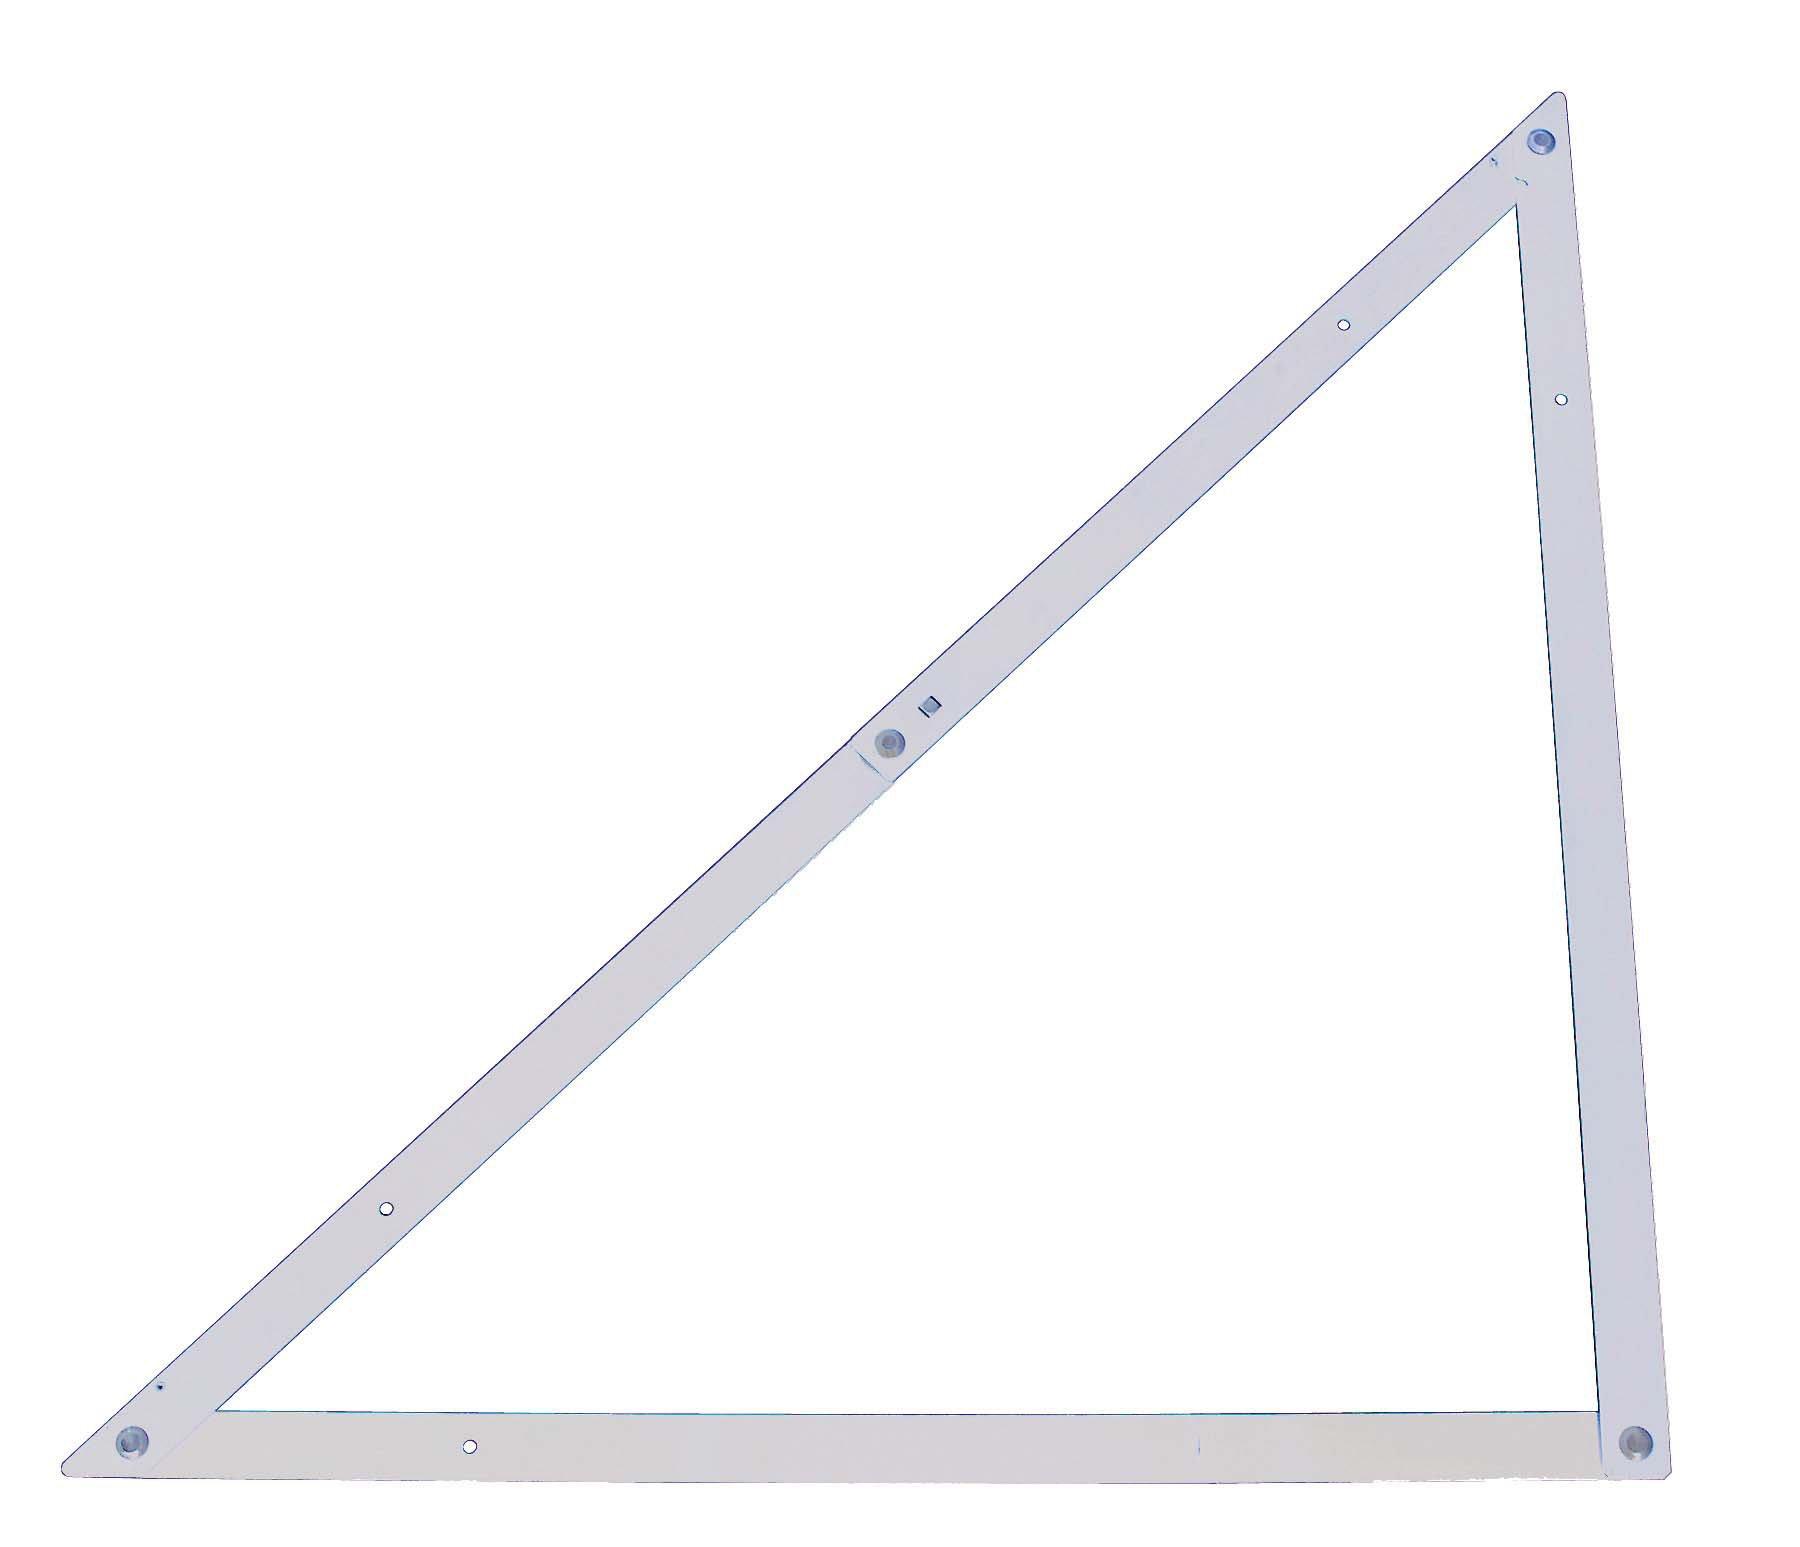 Stanley Folding Builders Square, Length: 172cm x Width: 122cm